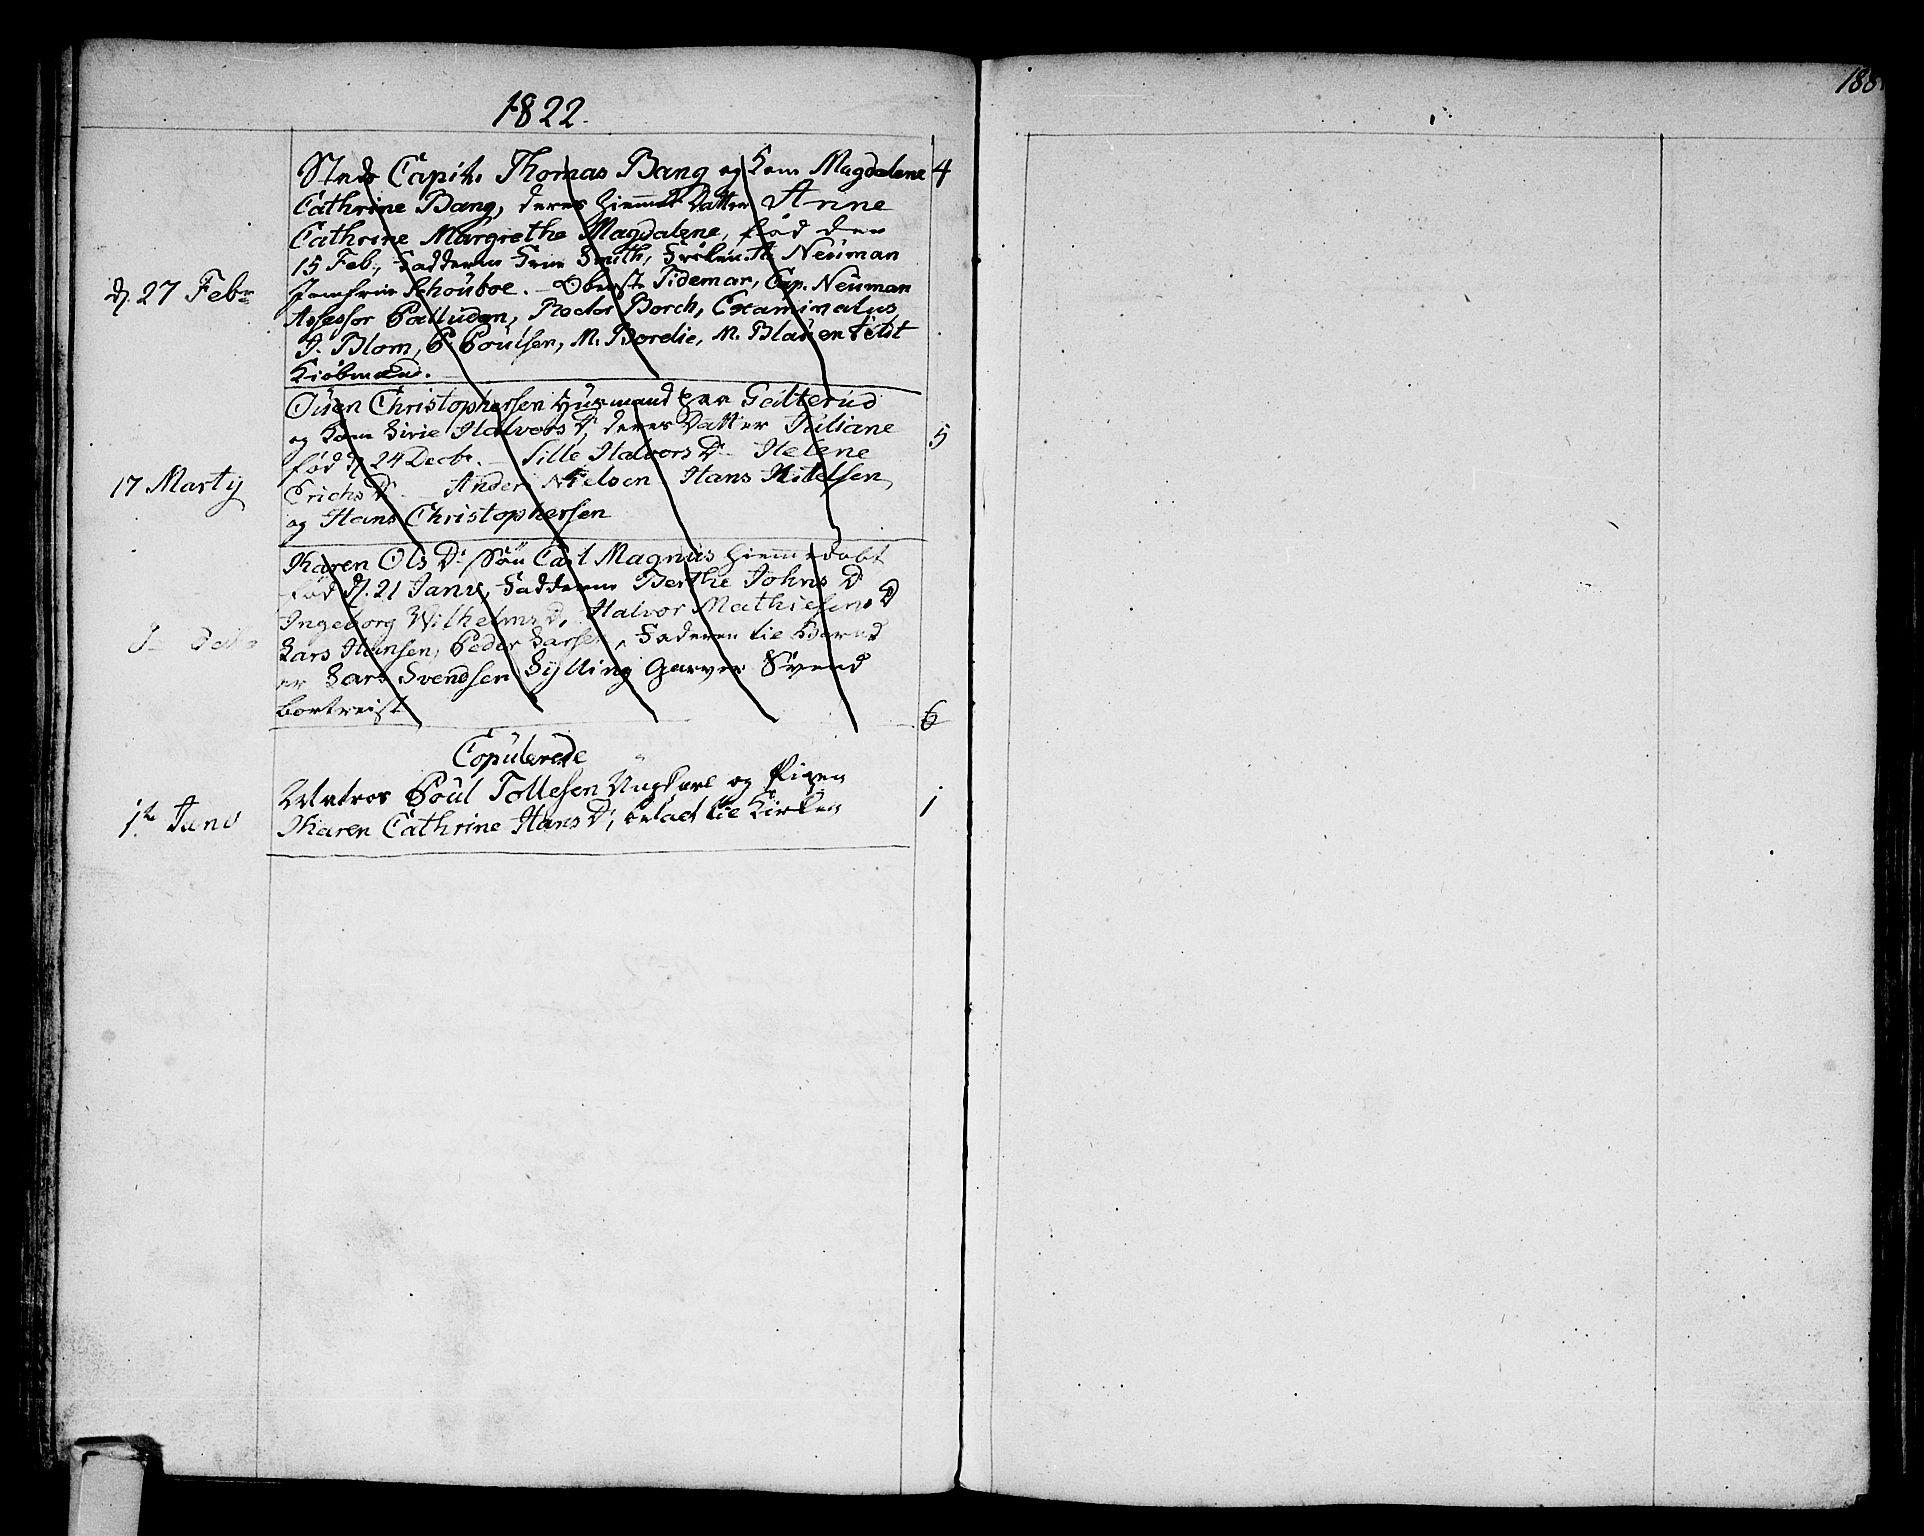 SAKO, Strømsø kirkebøker, F/Fa/L0010: Parish register (official) no. I 10, 1792-1822, p. 188